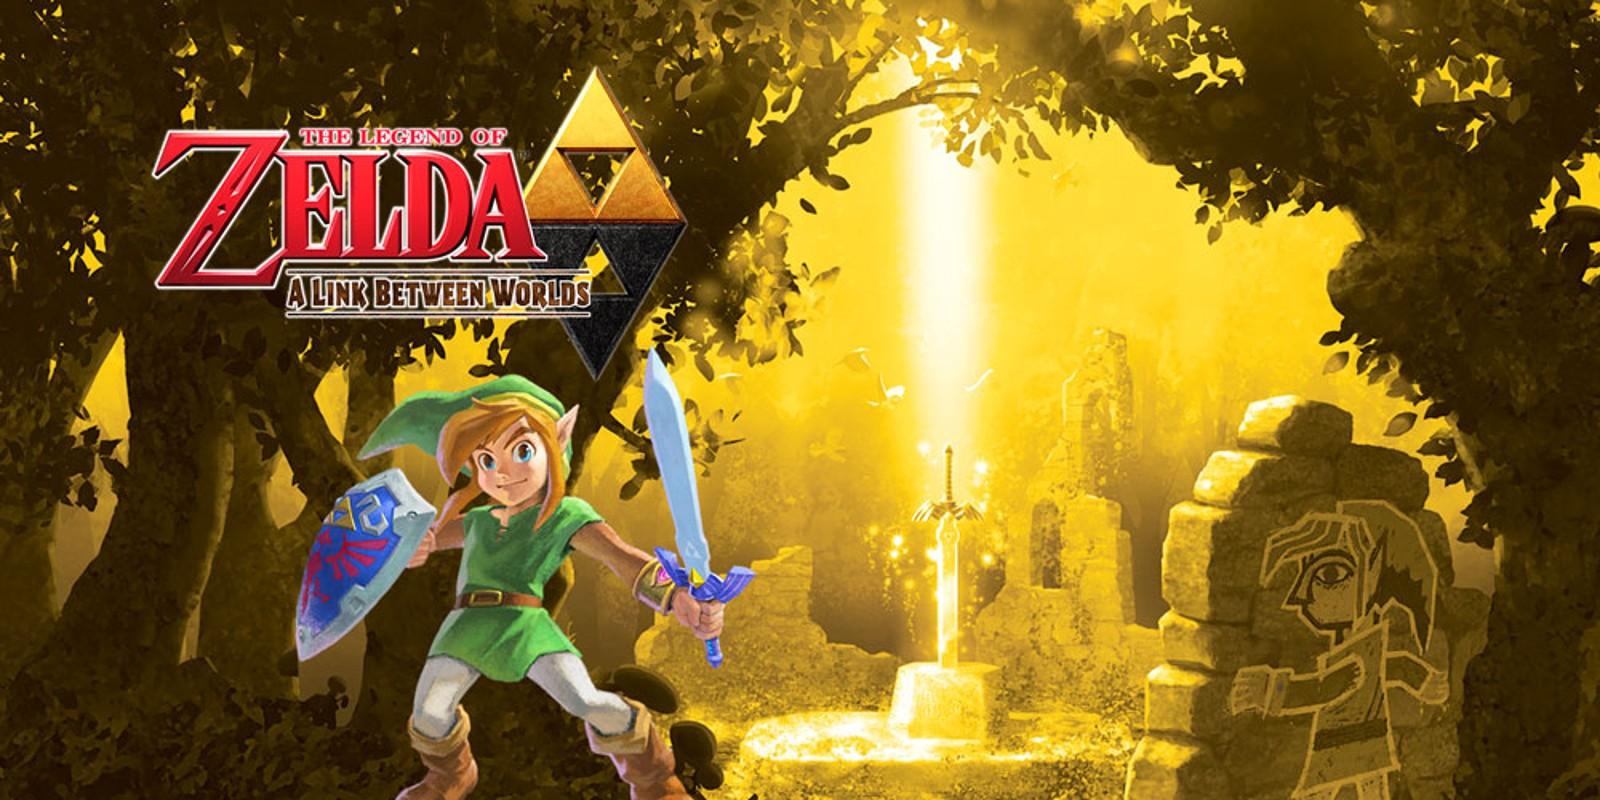 Zelda Ocarina Of Time 3d Wallpaper The Legend Of Zelda A Link Between Worlds Nintendo 3ds